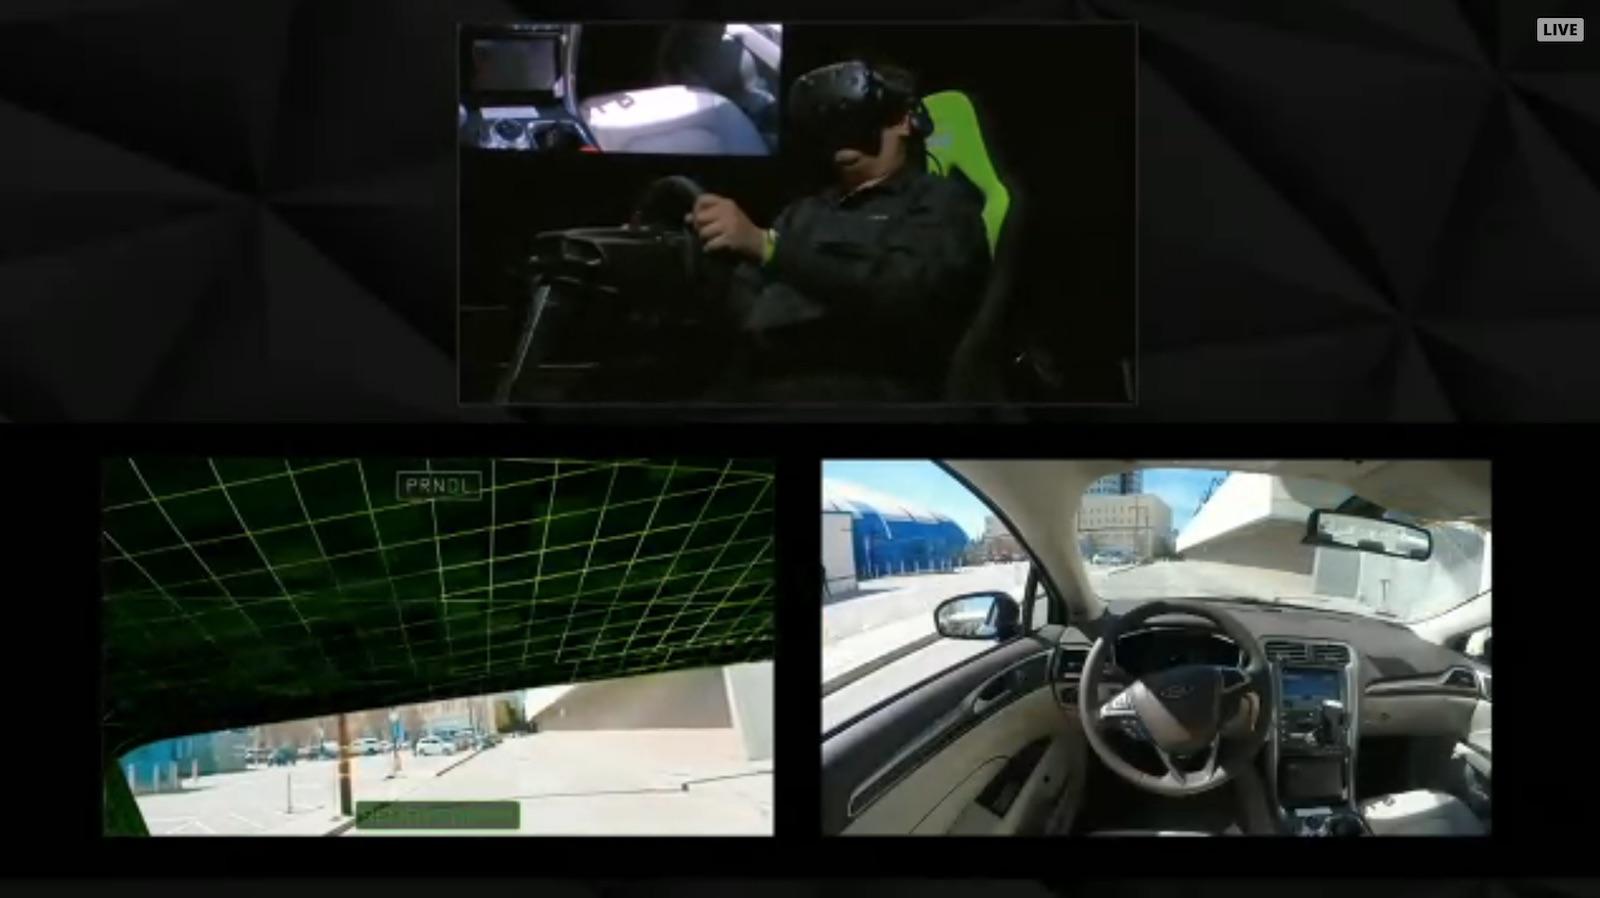 nvidia driving car in vr